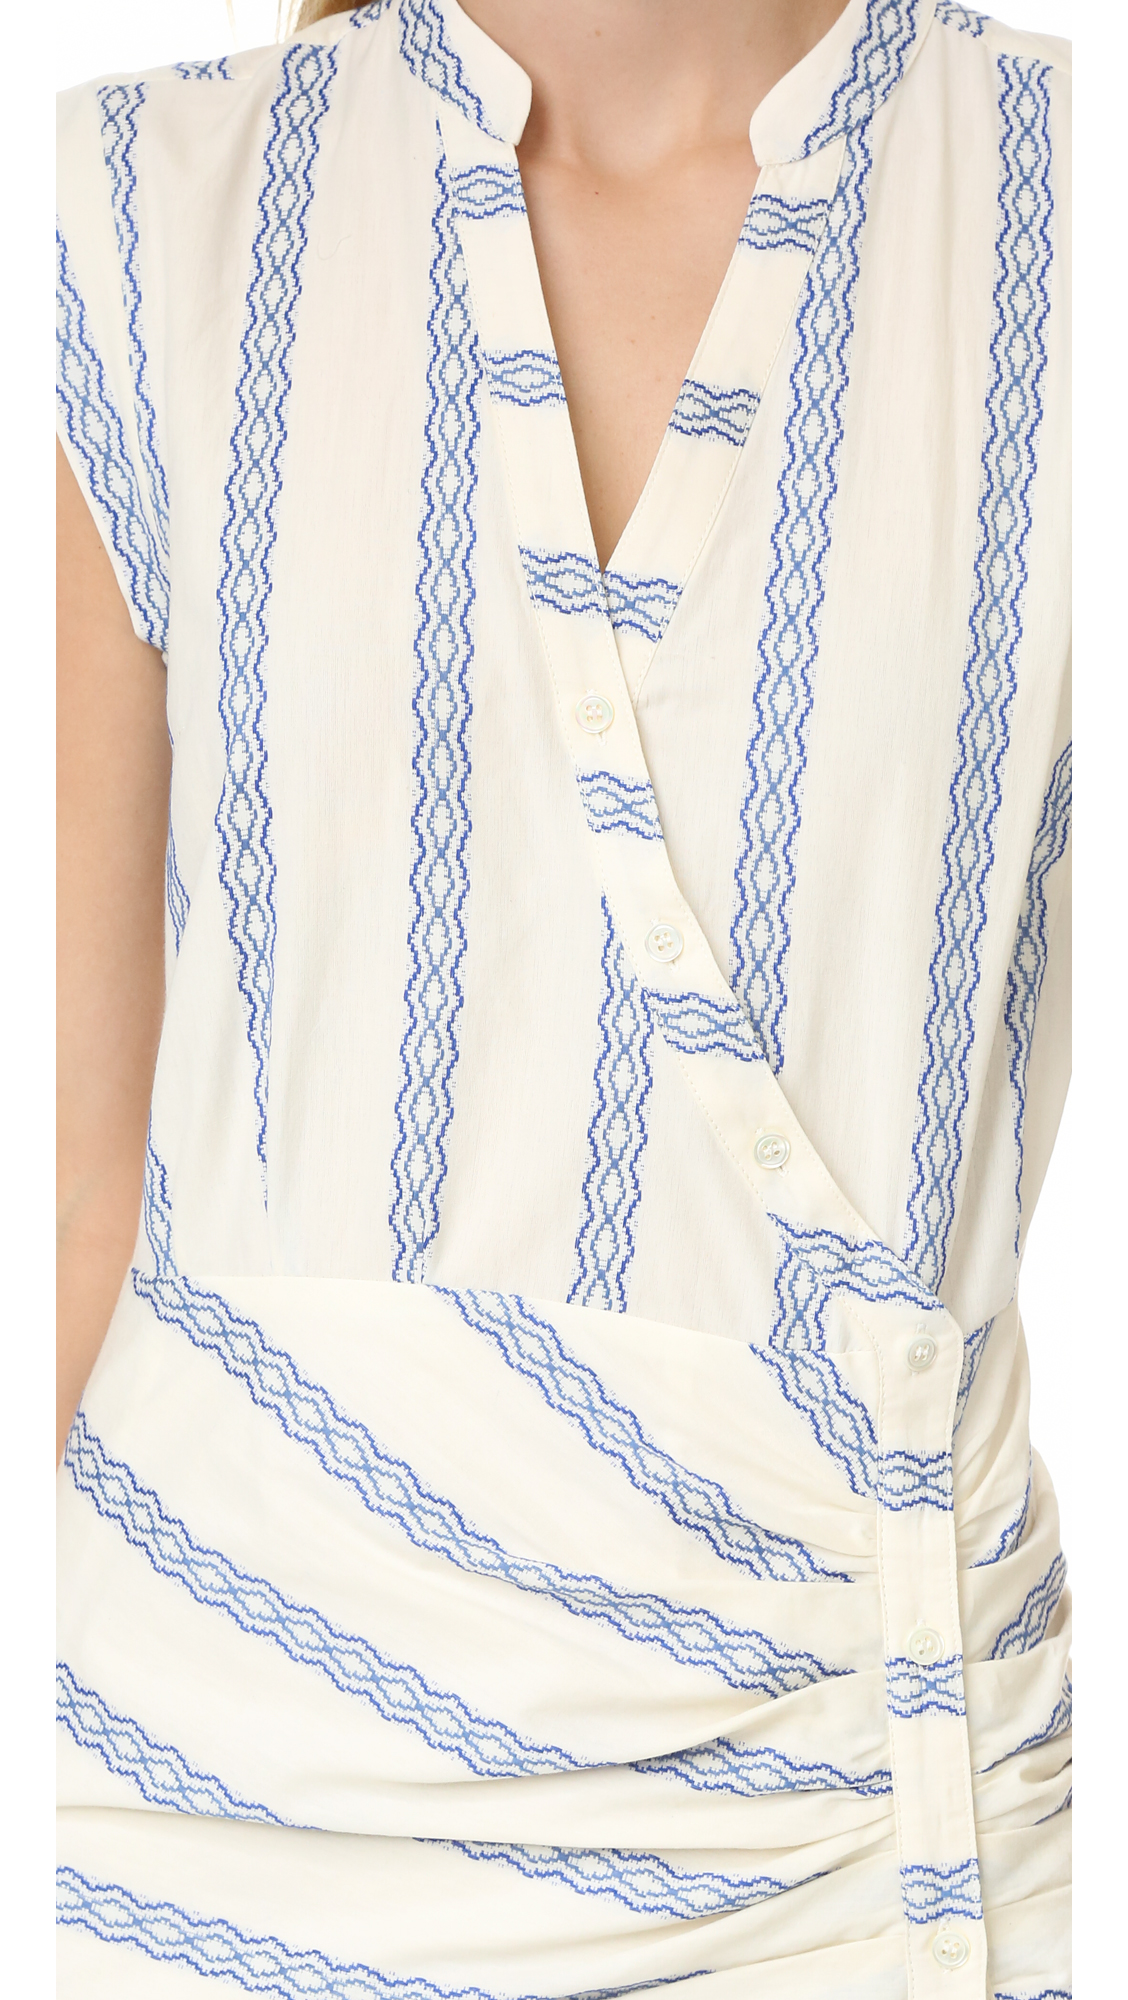 133cd1cacf1 Veronica Beard Piece   Co Ruched Shirtdress